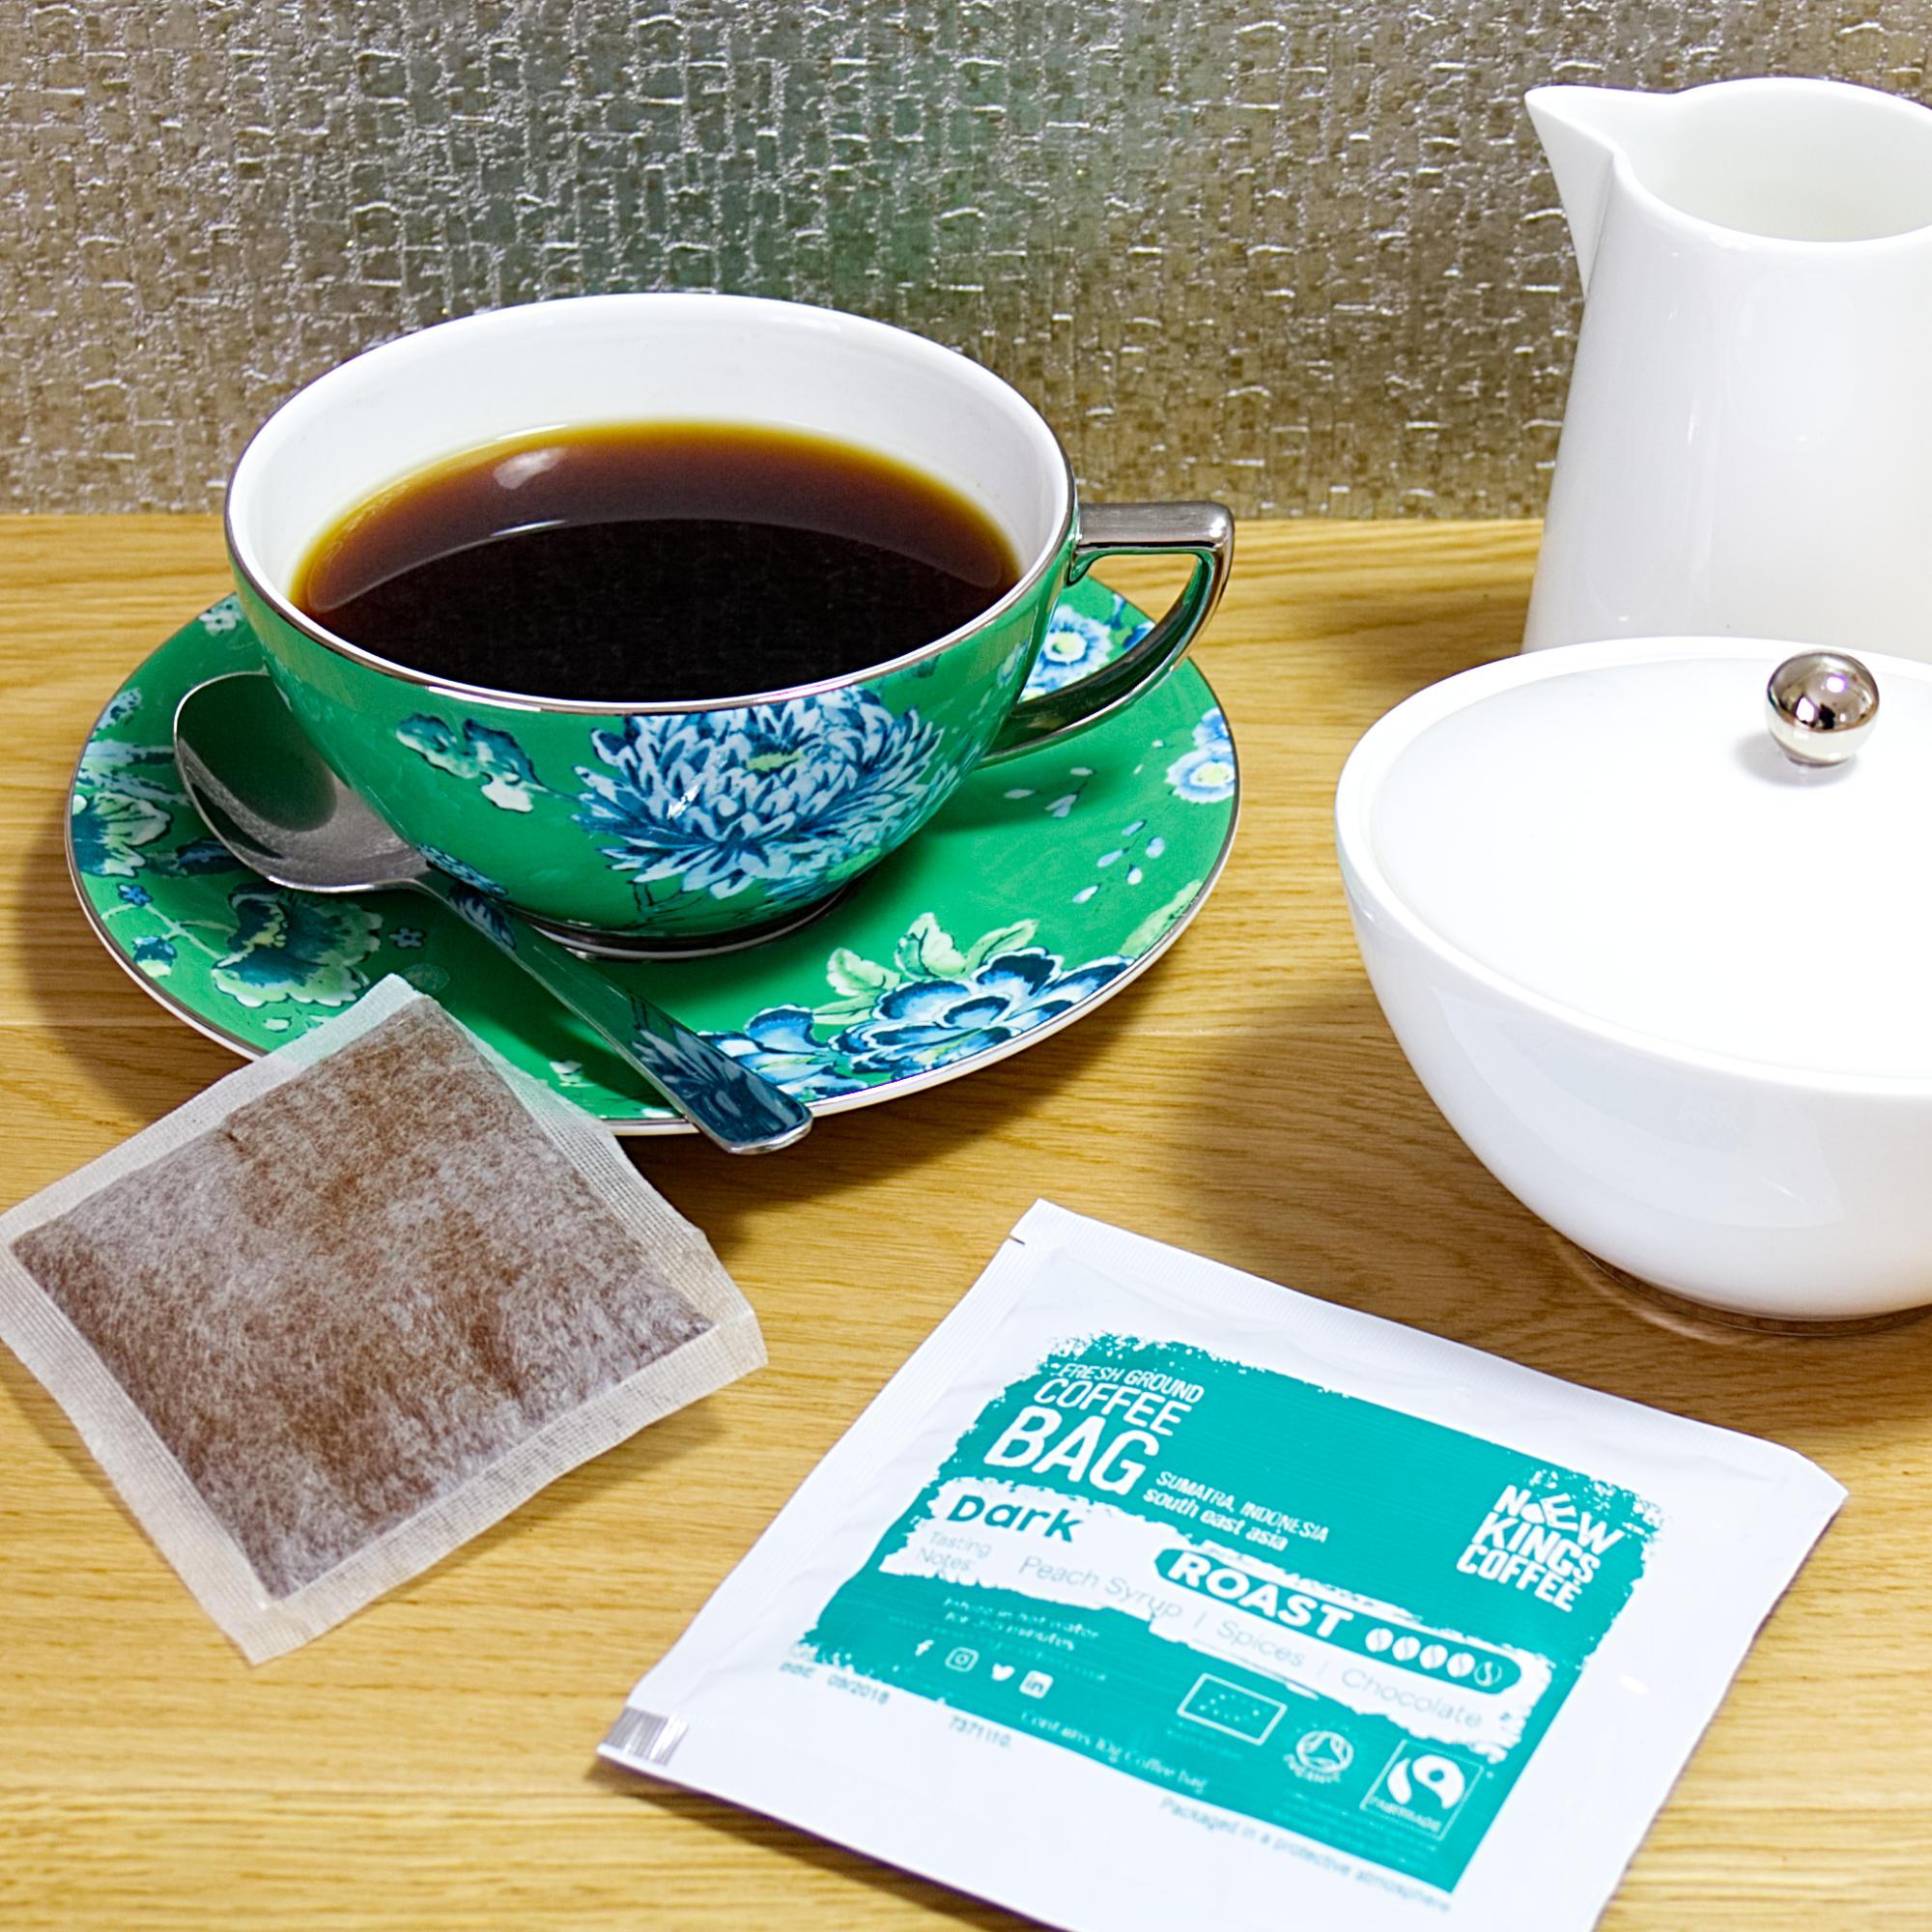 New-Kings-Coffee-Bags-Fairtrade-Organic-Sumatra-with-milk-and-sugar-square.jpg